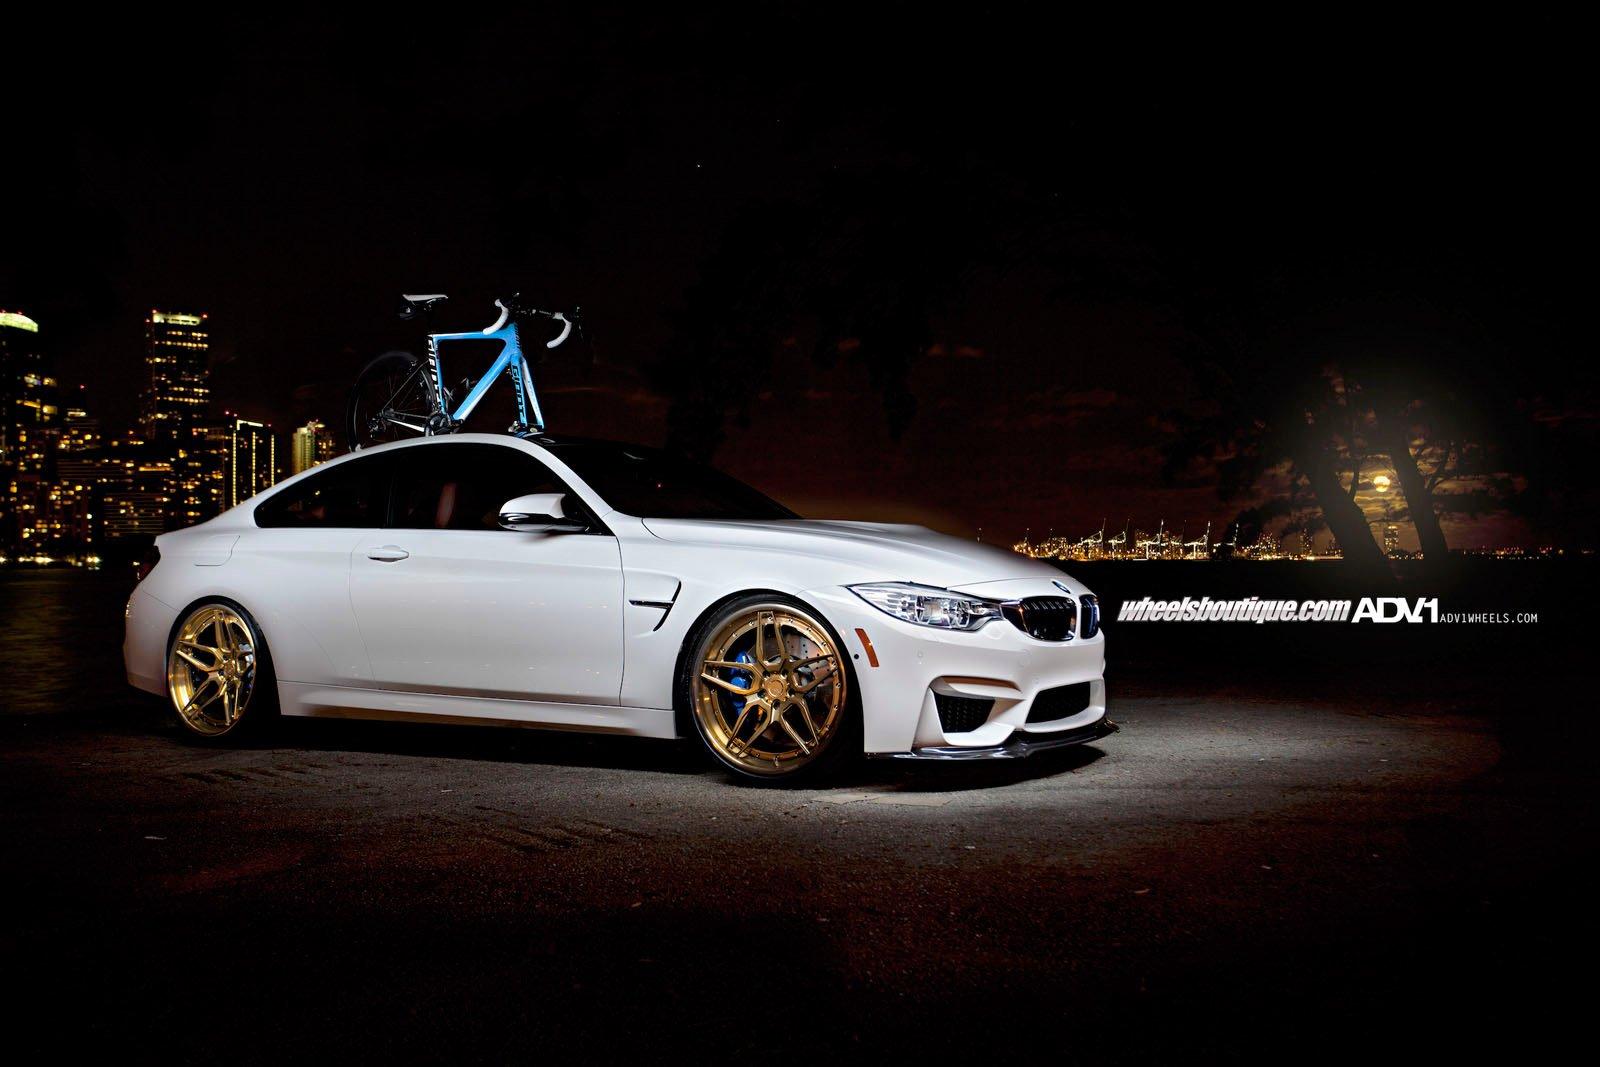 2014_ADV1_bmw_m4_supercars_wheels_1600x1067.jpg